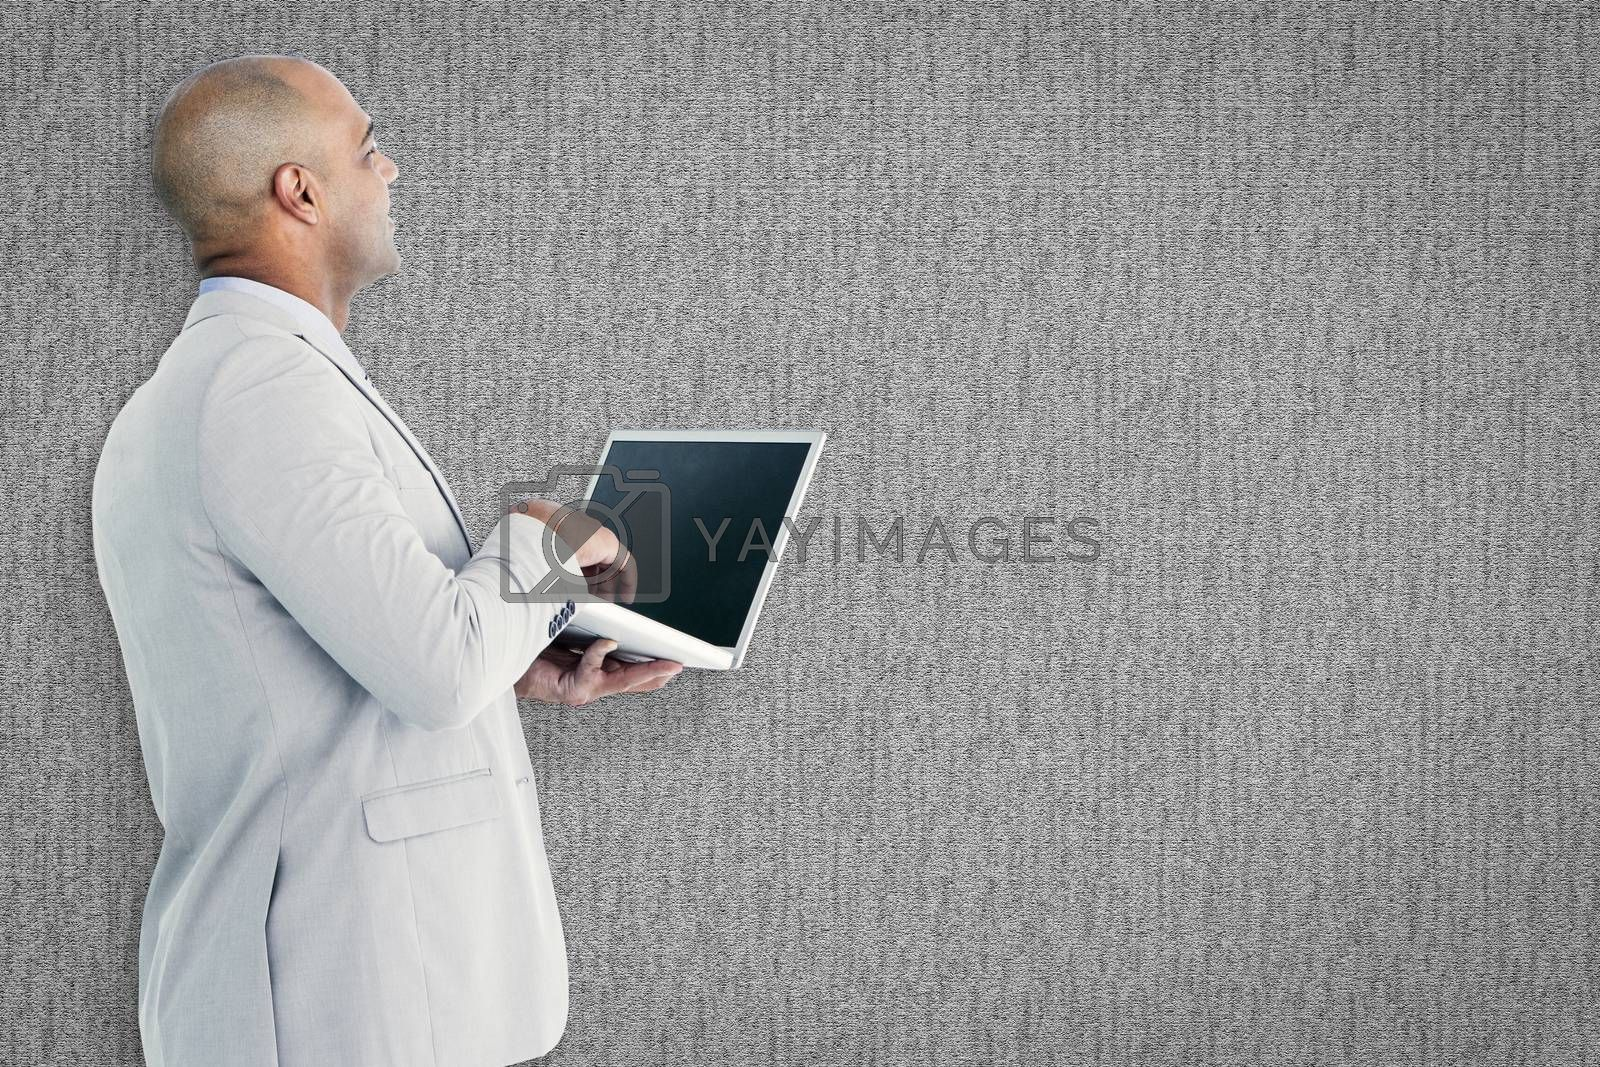 Businessman using laptop against grey background